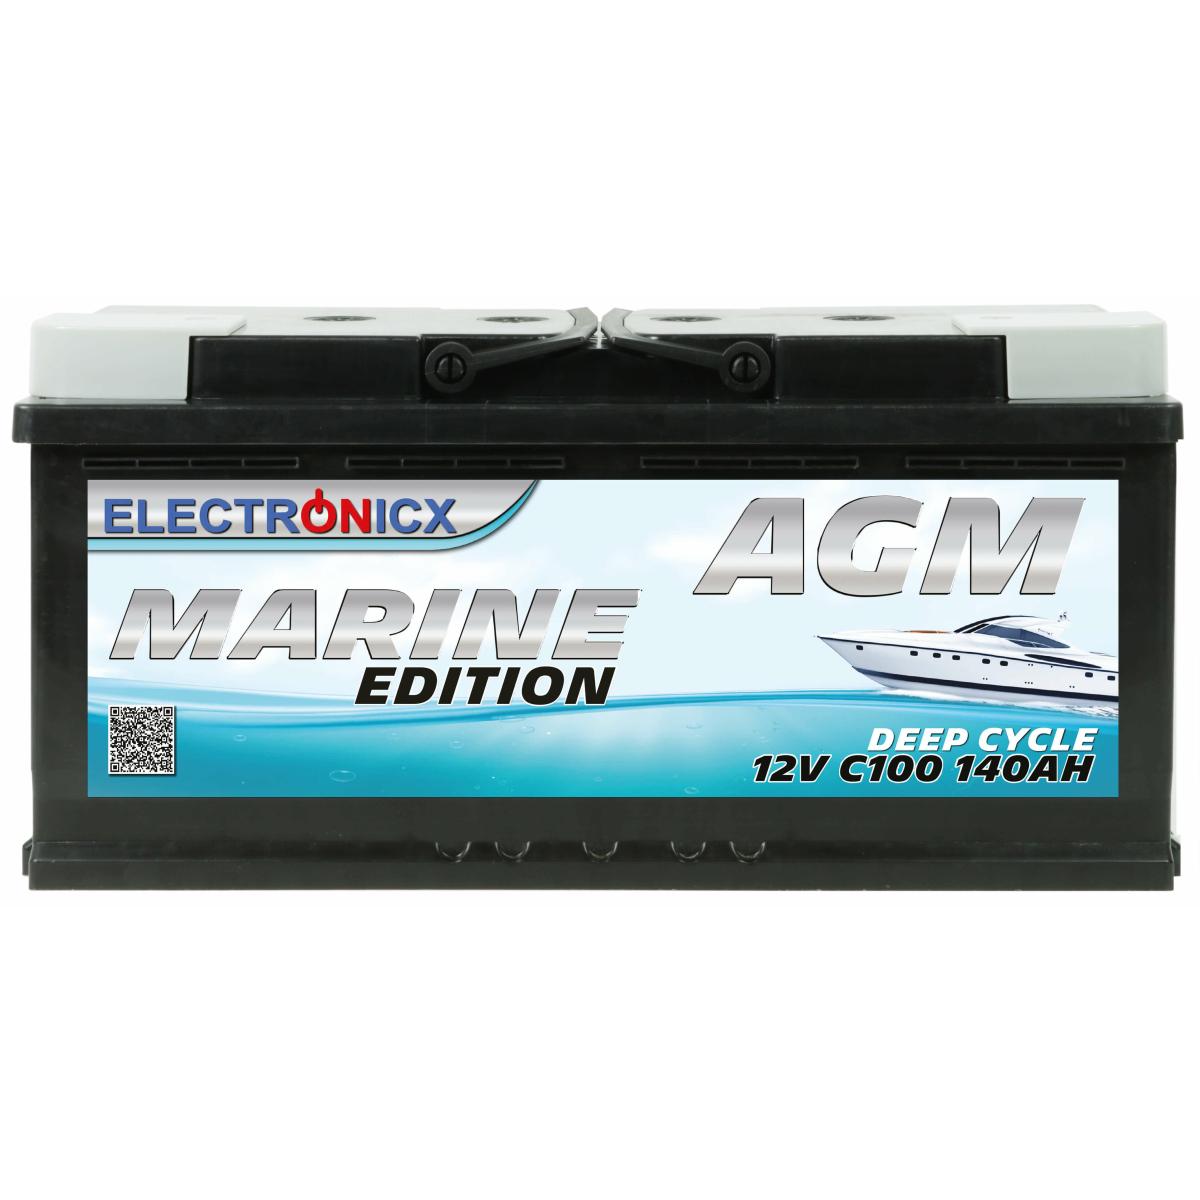 AGM Batterie 140AH Electronicx Marine Edition Boot Schiff Versorgungsbatterie 12V Akku Deep Bootsbatterie Autobatterie Solarbatterie Solar Batterien…